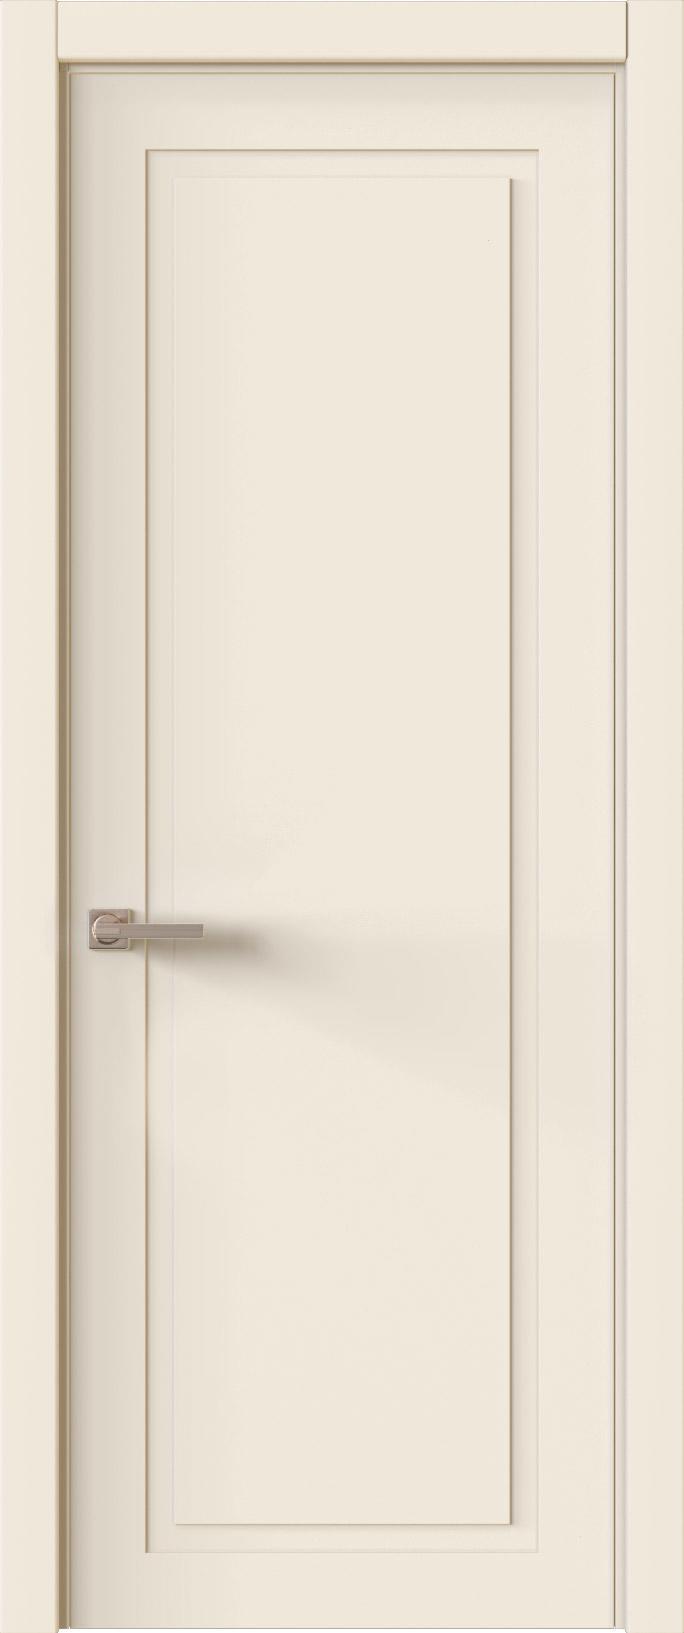 Tivoli Д-5 цвет - Бежевая эмаль (RAL 9010) Без стекла (ДГ)